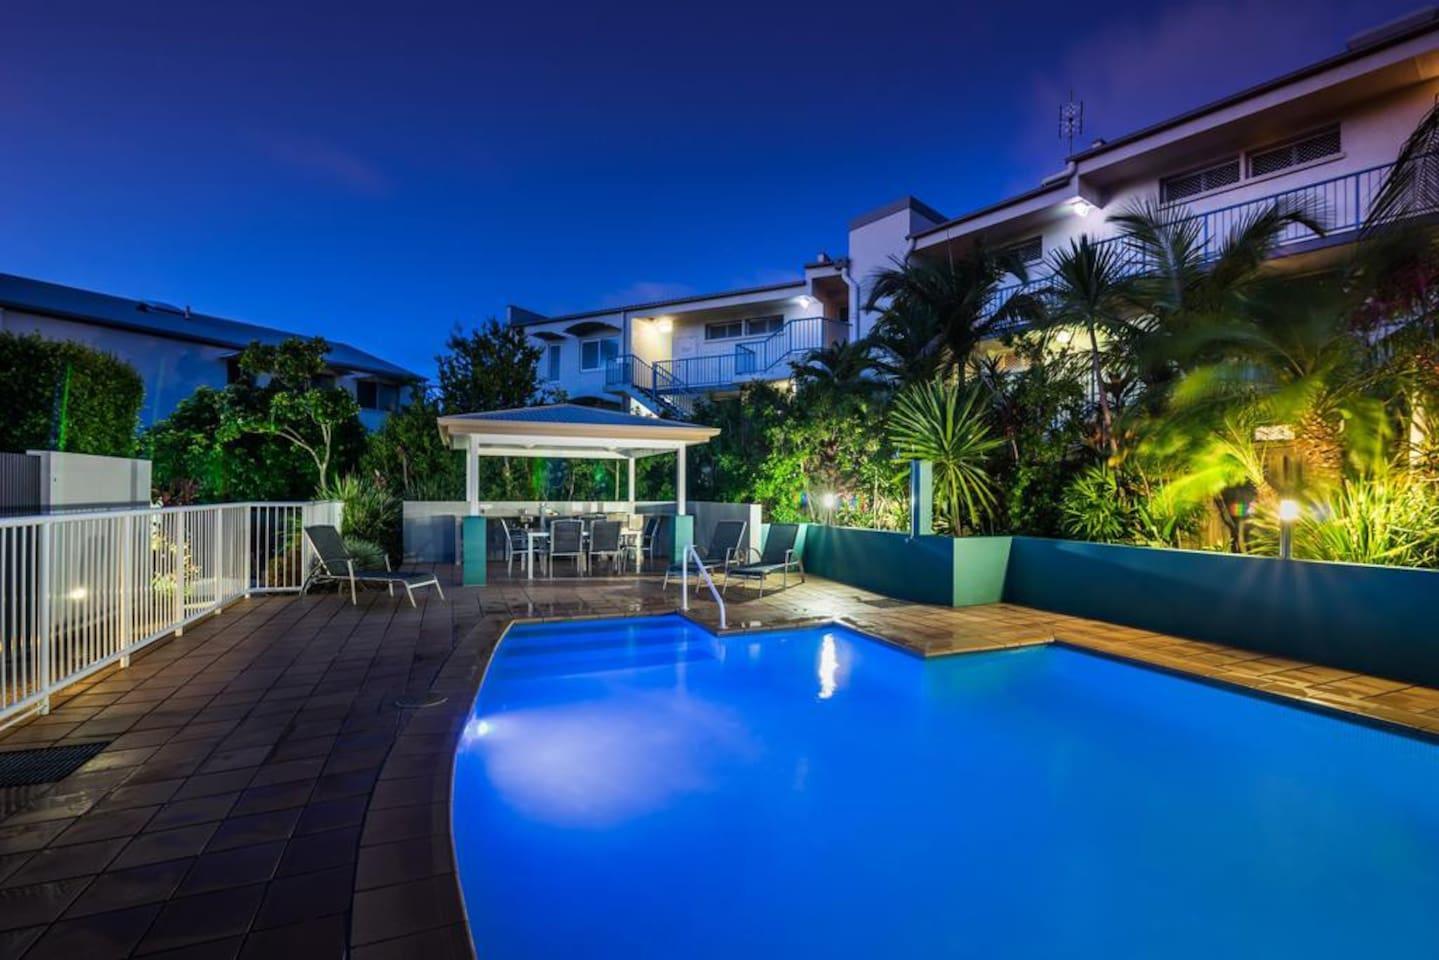 Apartment 2BR Coolum Beach    Rooftop Terrace   Spa   Tennis   Pool photo 26289860